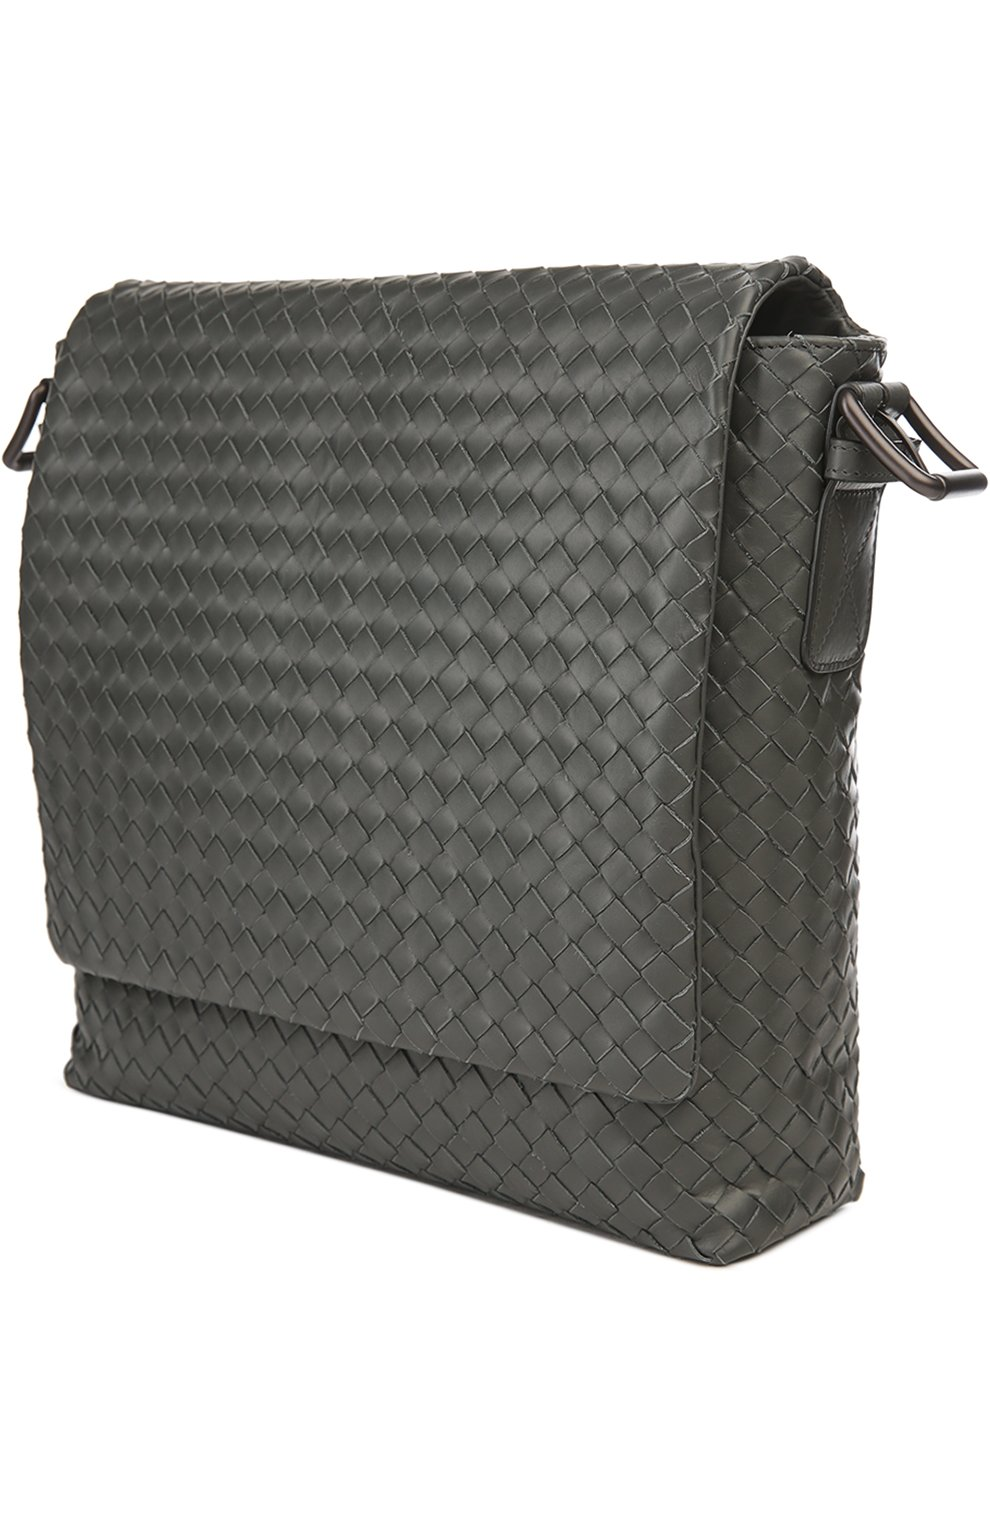 8400e21ada12e Кожаная сумка-планшет с плетением intrecciato Bottega Veneta темно-серая